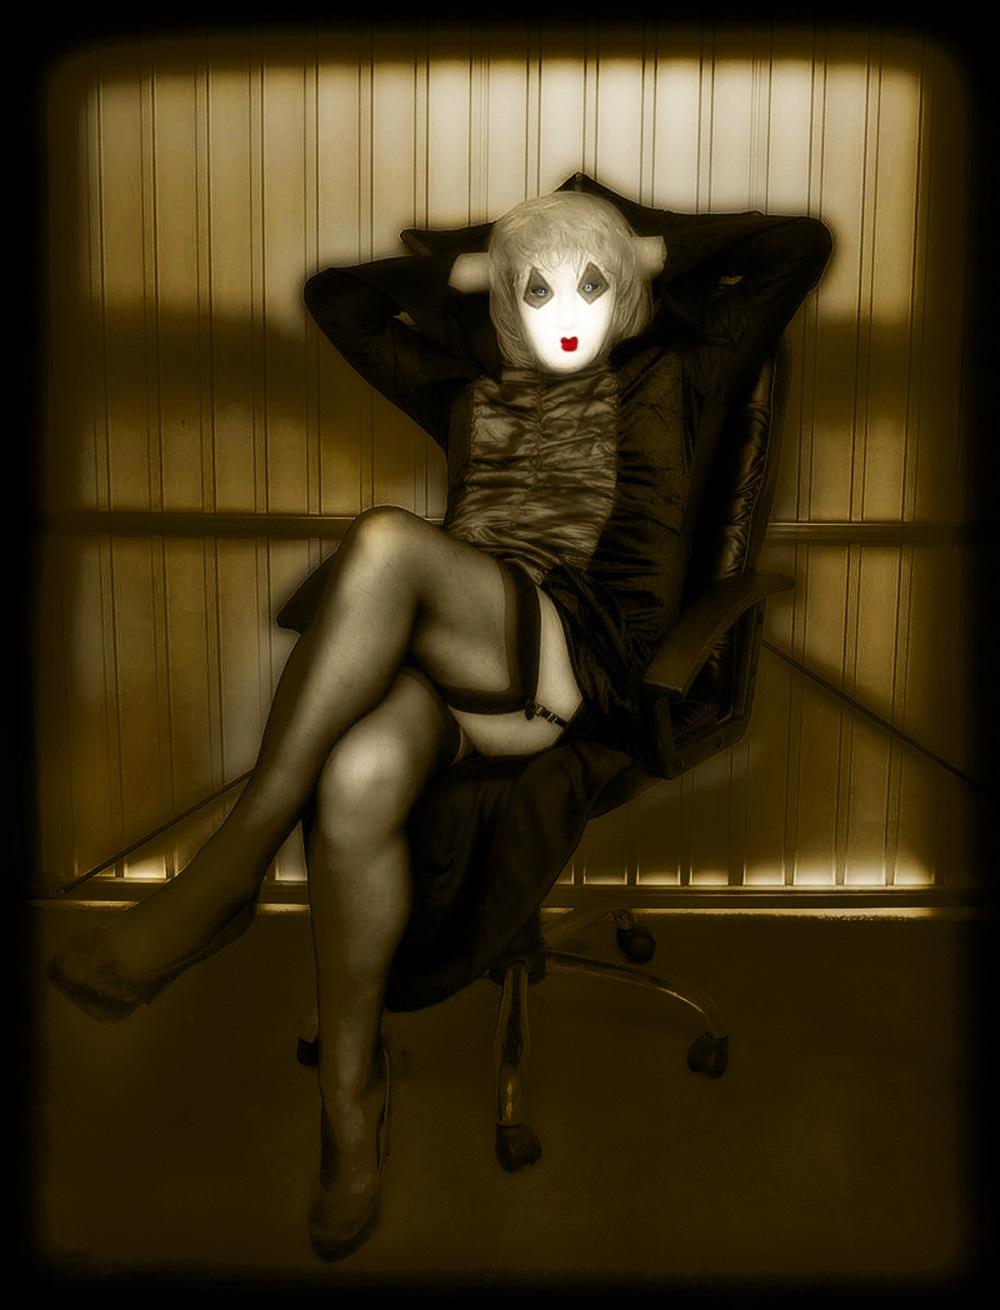 Mrs Clown by james arthur